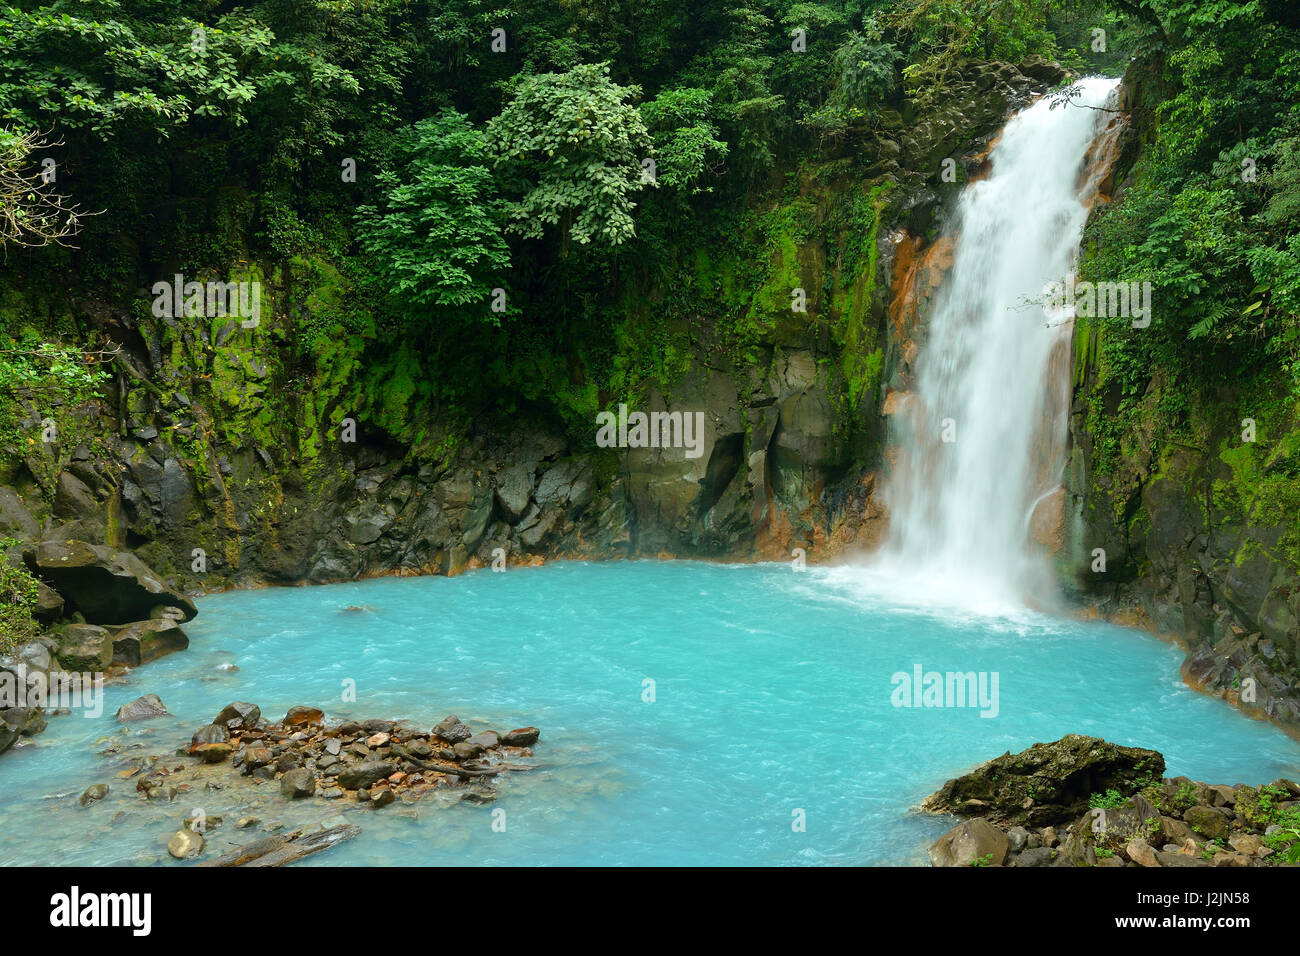 Cascada con las azules aguas del Río Celeste en el Parque Nacional Volcán Tenorio, Costa Rica, Centroamérica Imagen De Stock